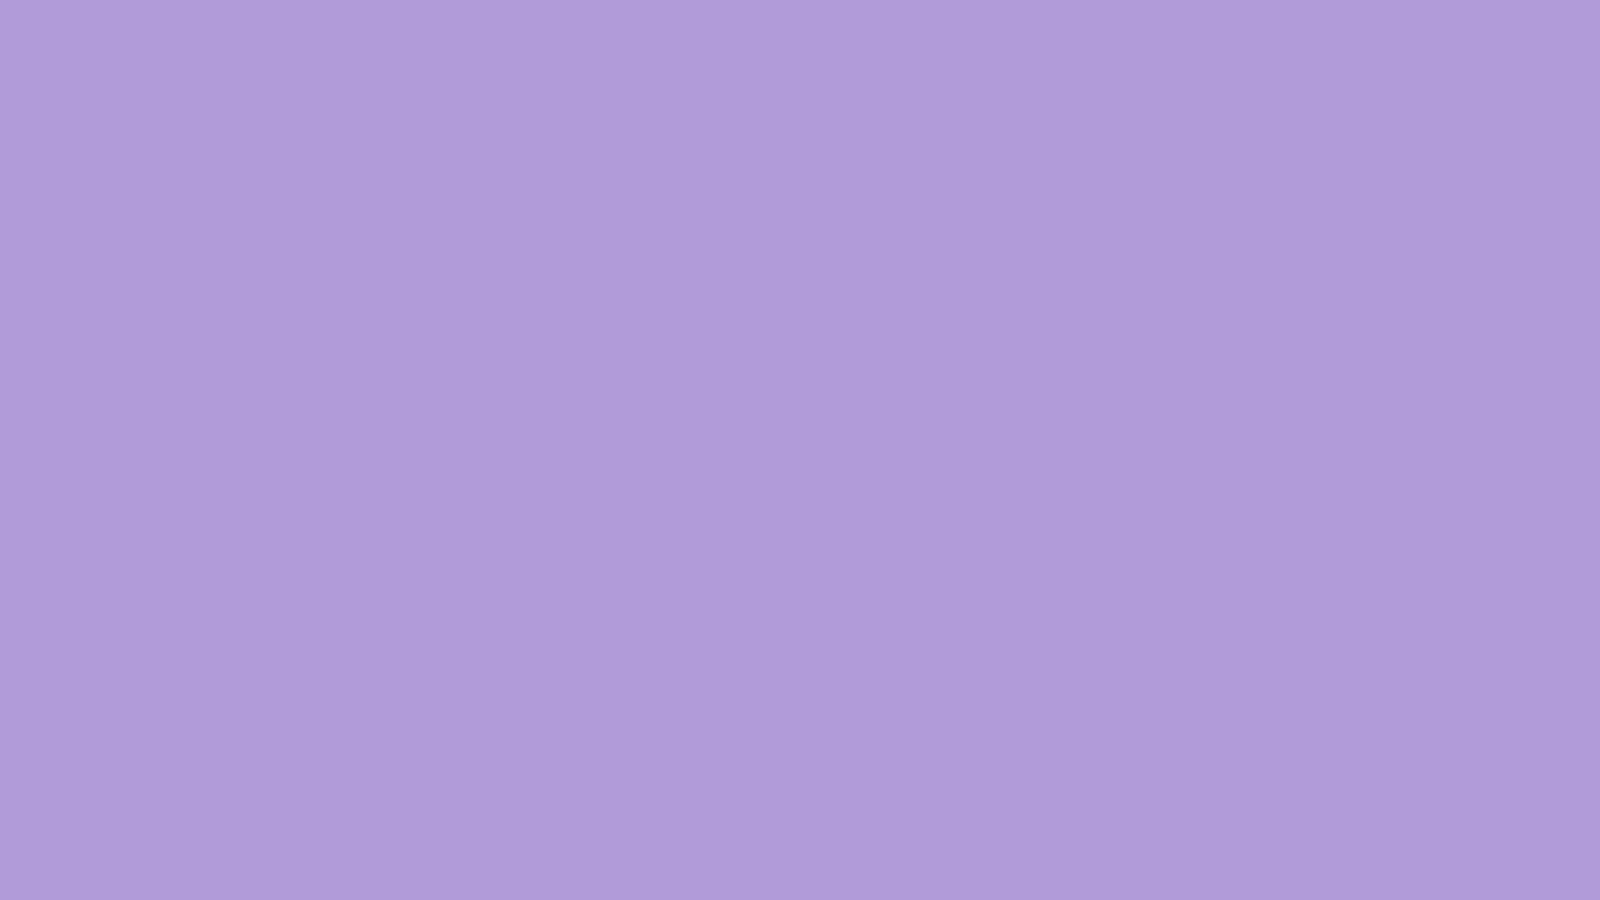 1600x900 Light Pastel Purple Solid Color Background